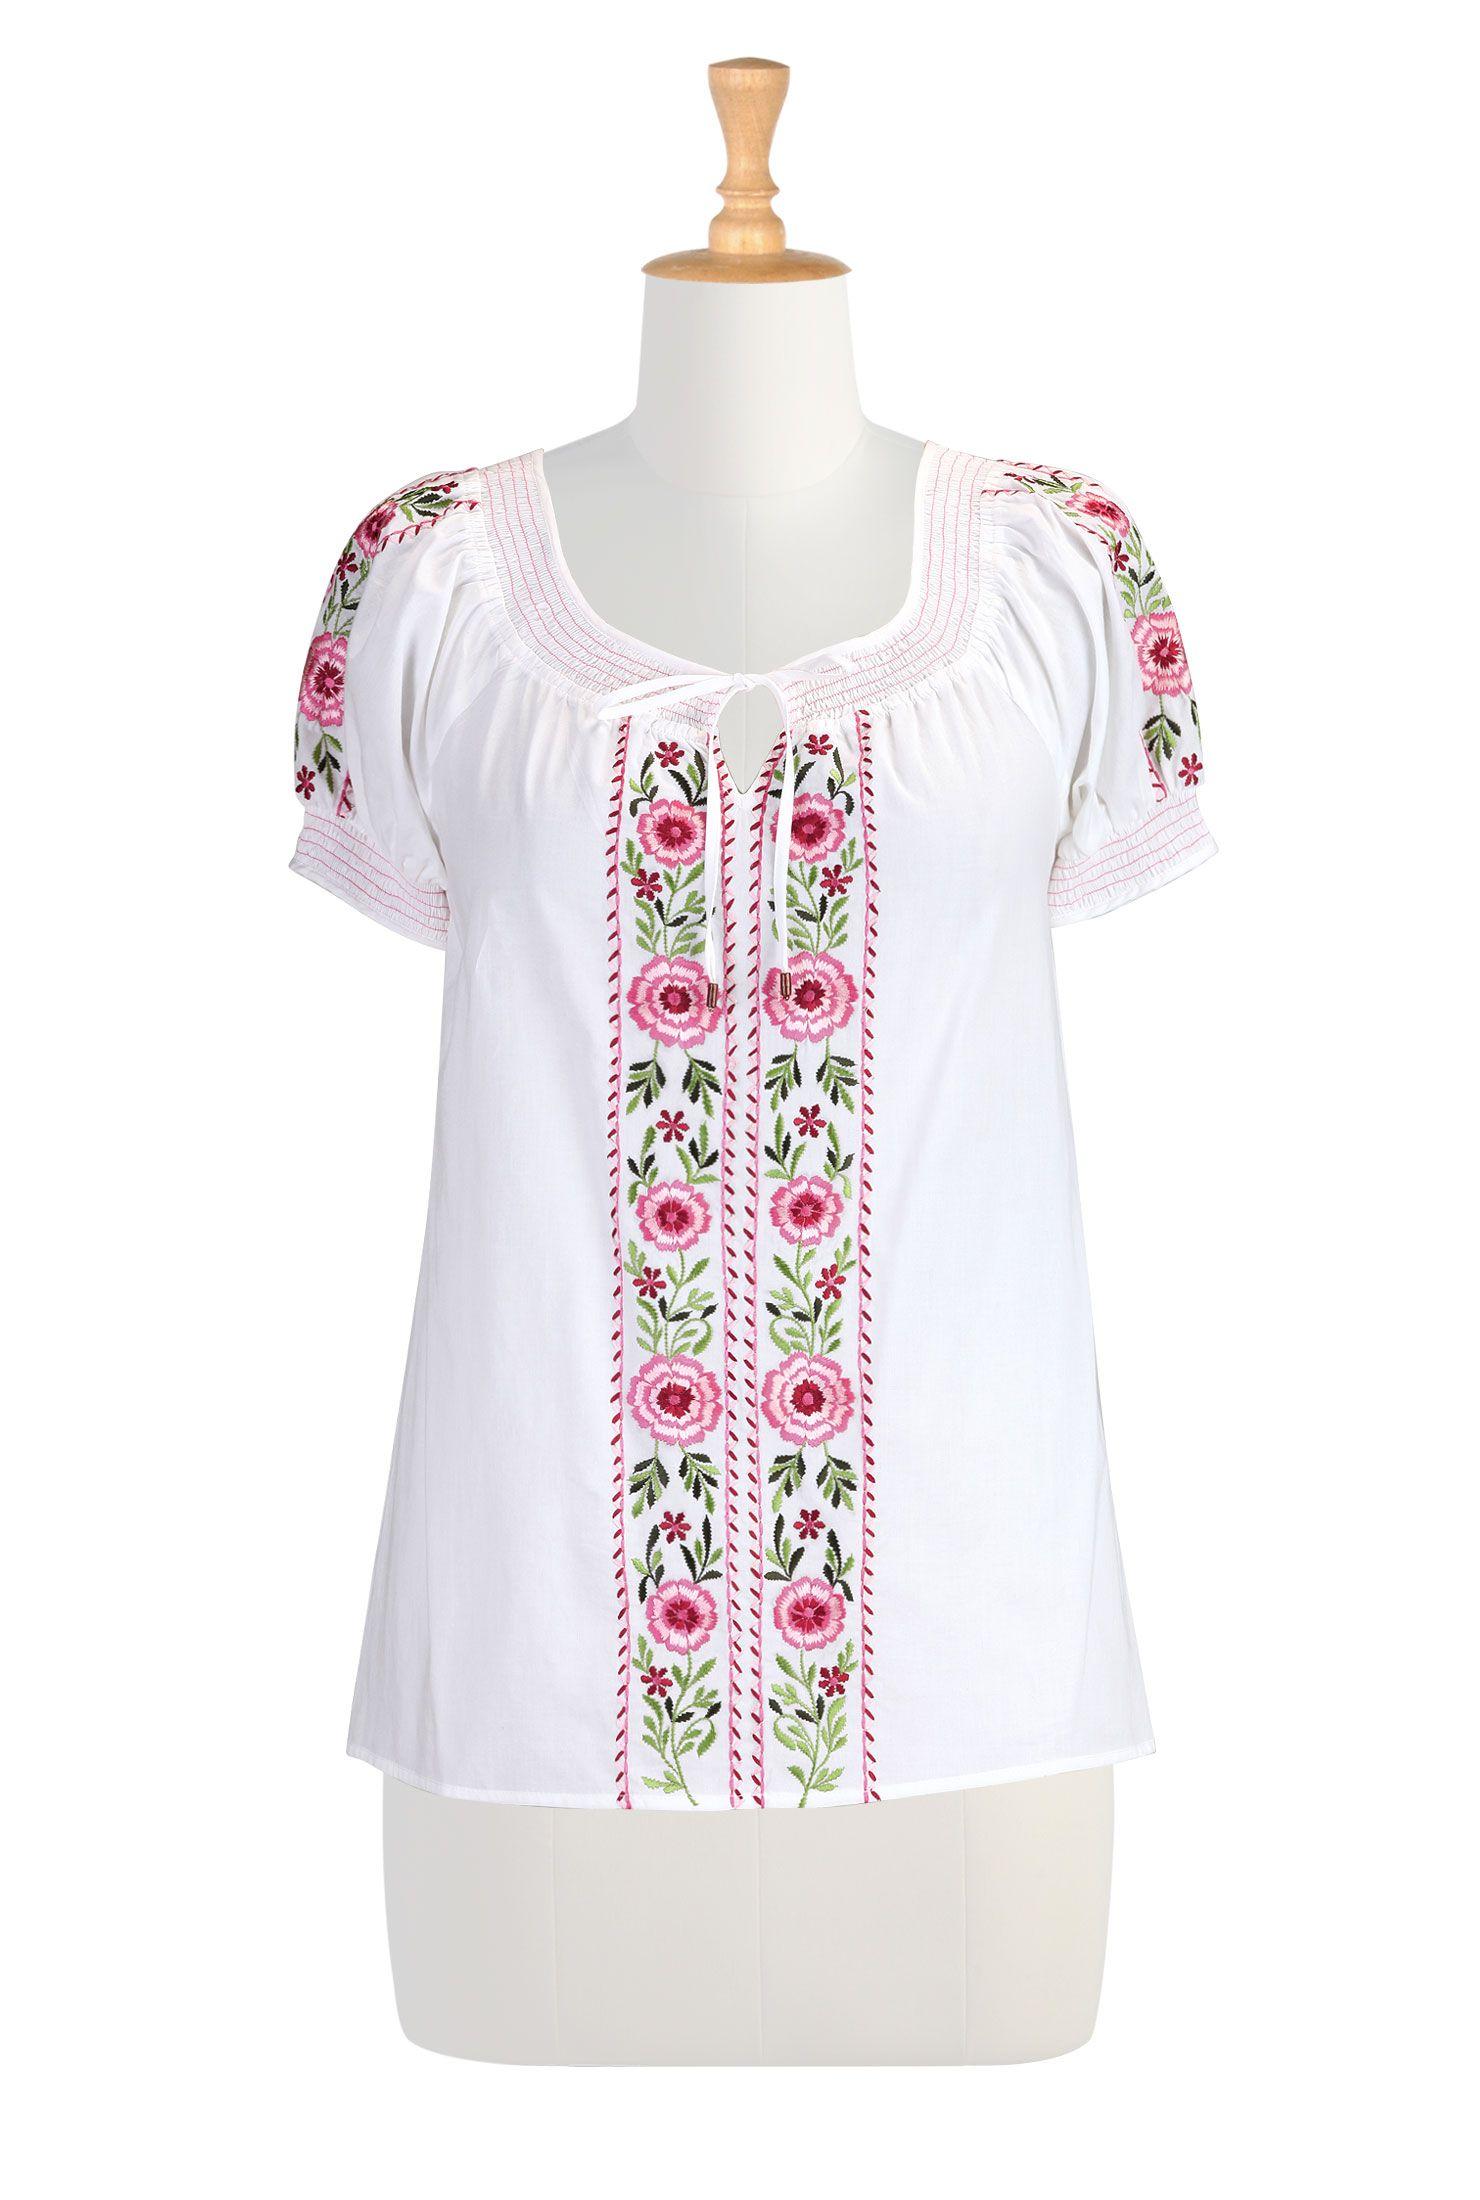 3273e69dc12 Women's designer clothing - Shop Women's Long Sleeve Tops - Tunic Tops, Ladies  Tops, Fashion Tops, Plus Size Tops - | eShakti.com